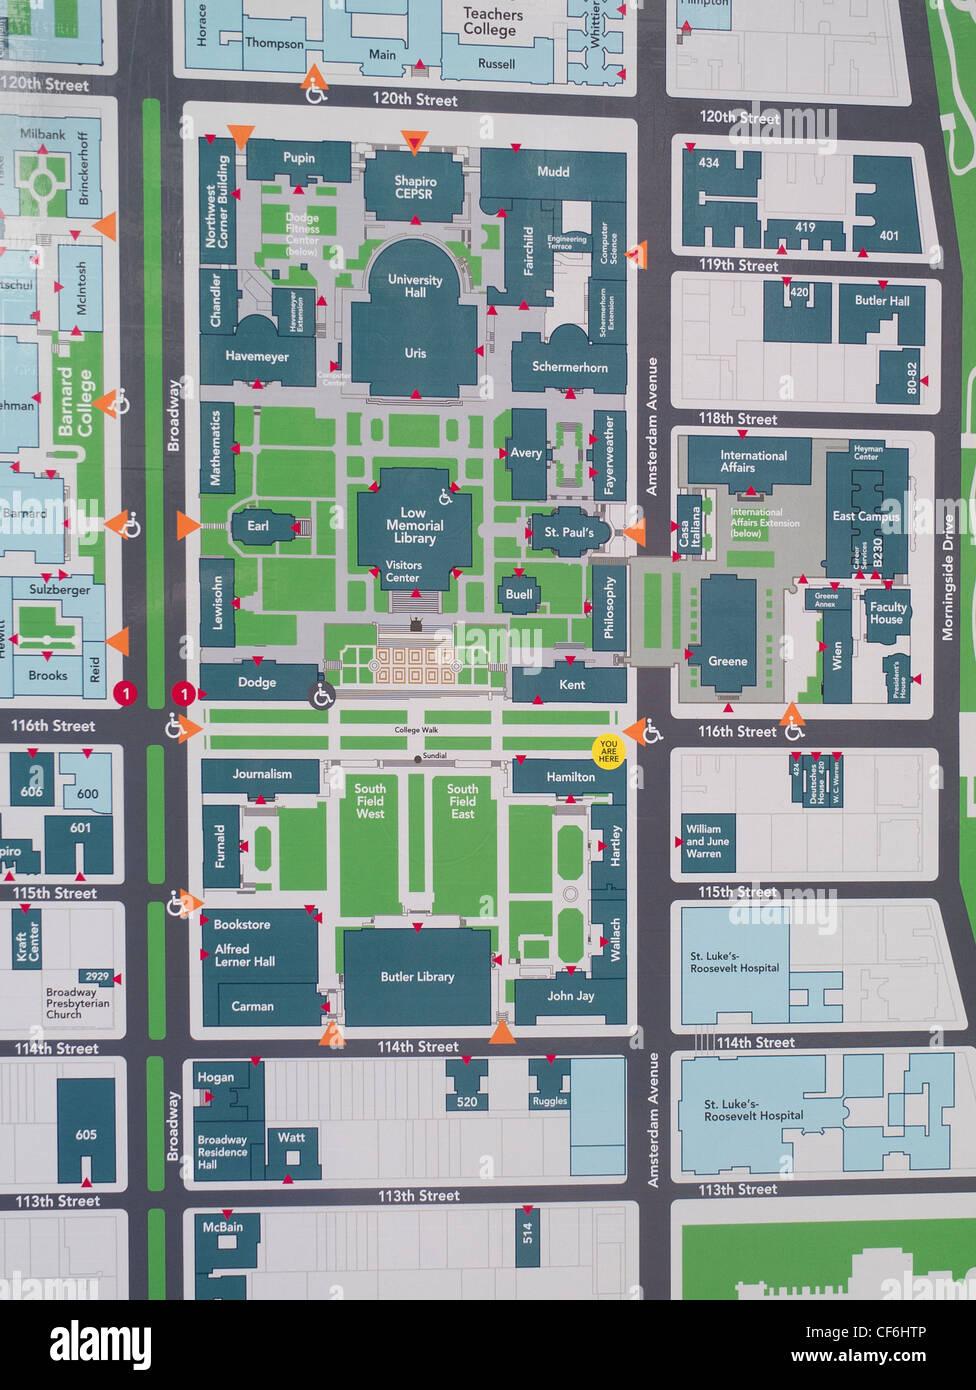 columbia university campus map